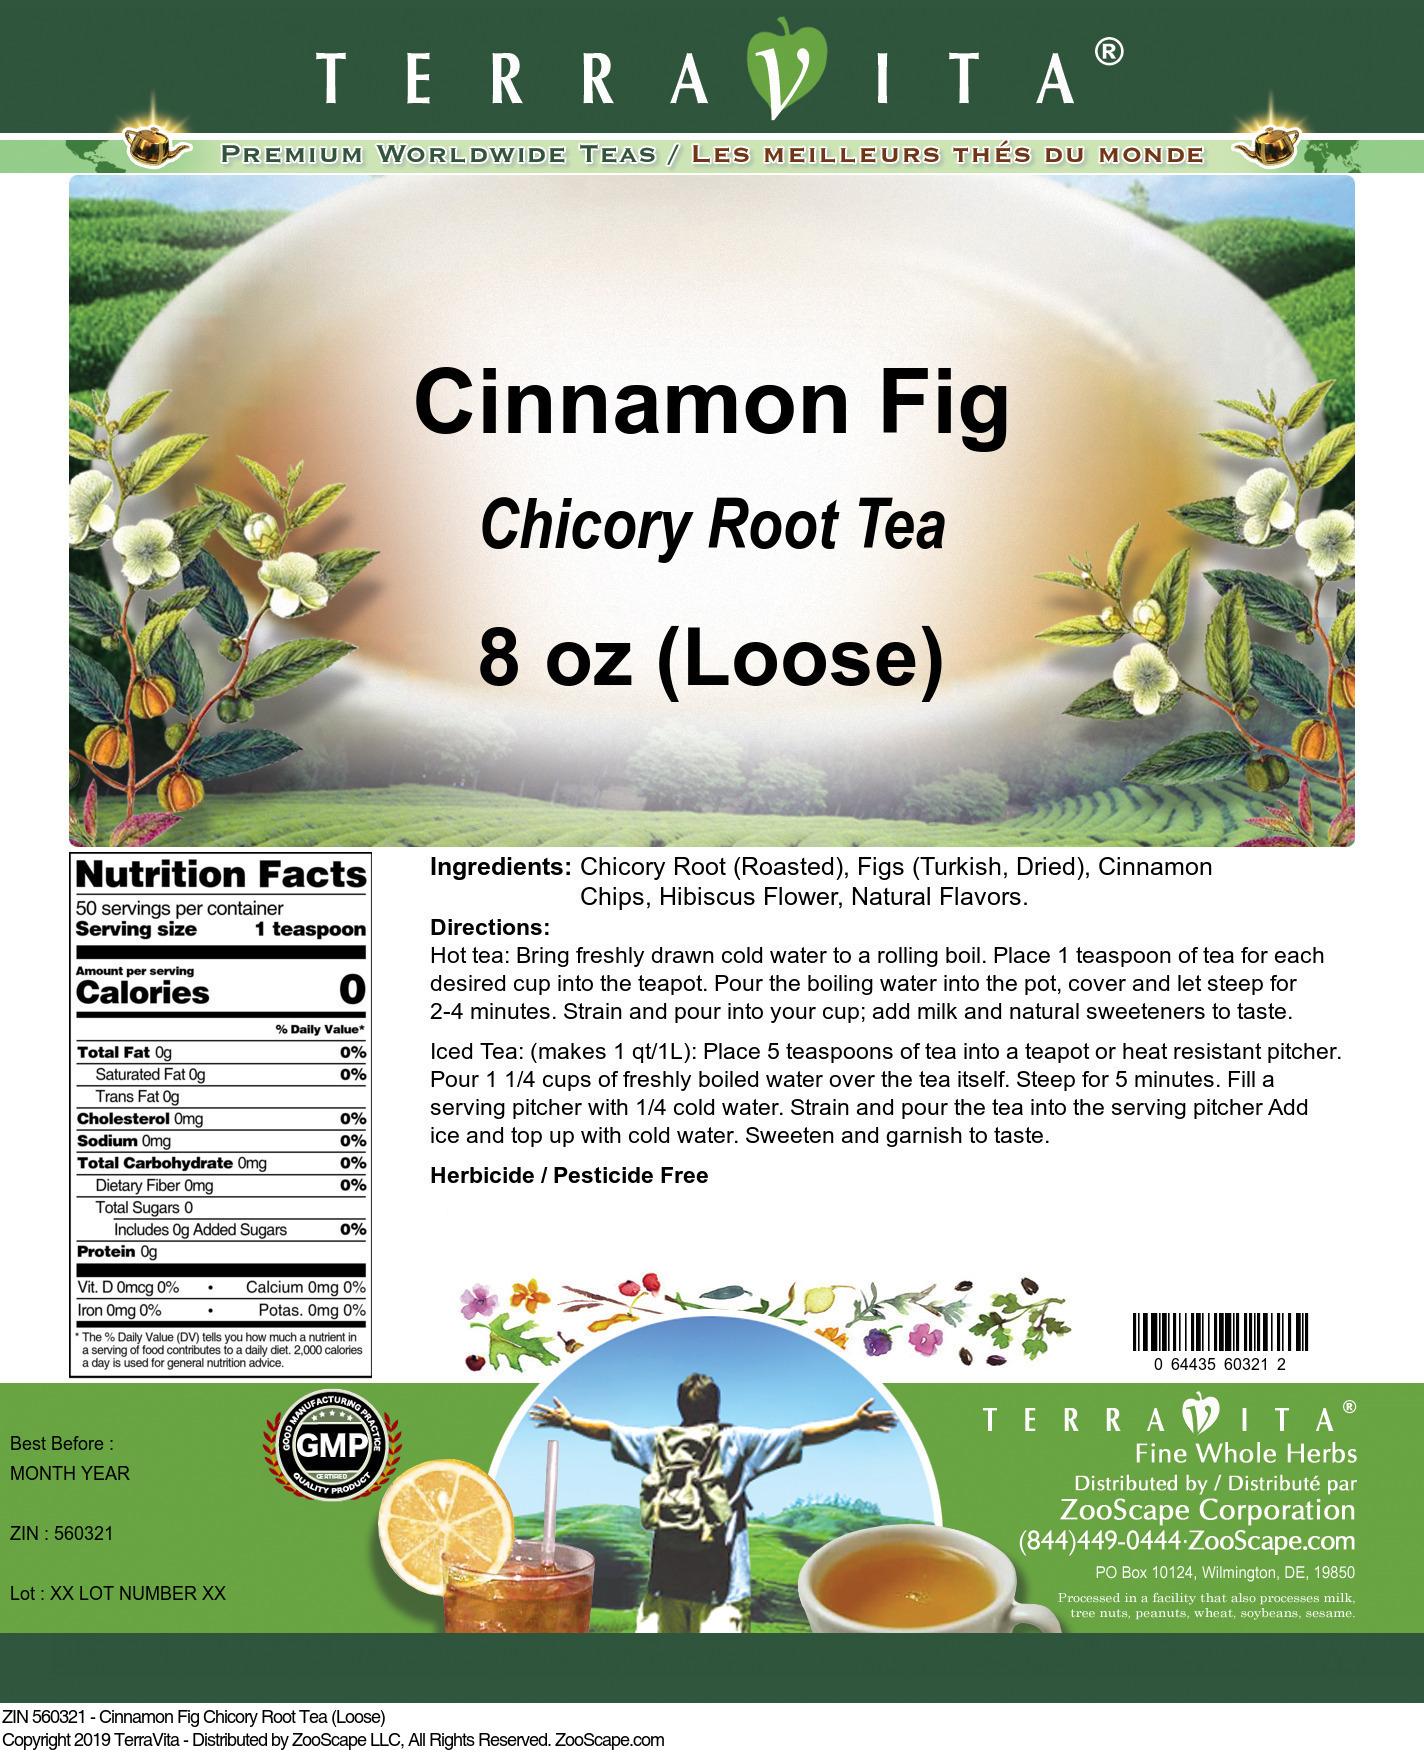 Cinnamon Fig Chicory Root